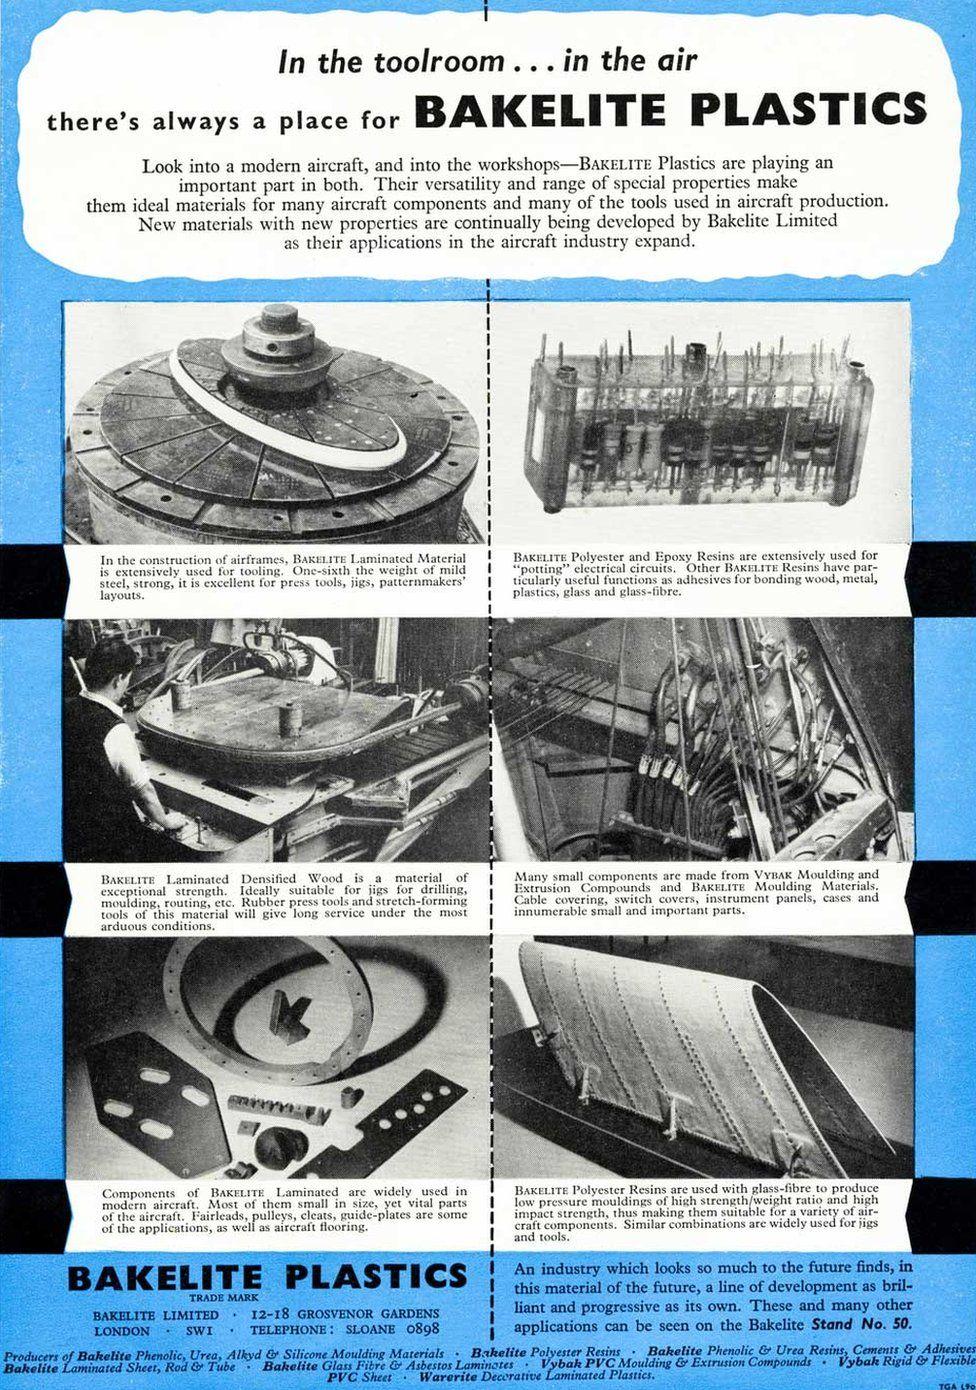 An advert for Bakelite plastics in an aircraft industry trade magazine circa 1955